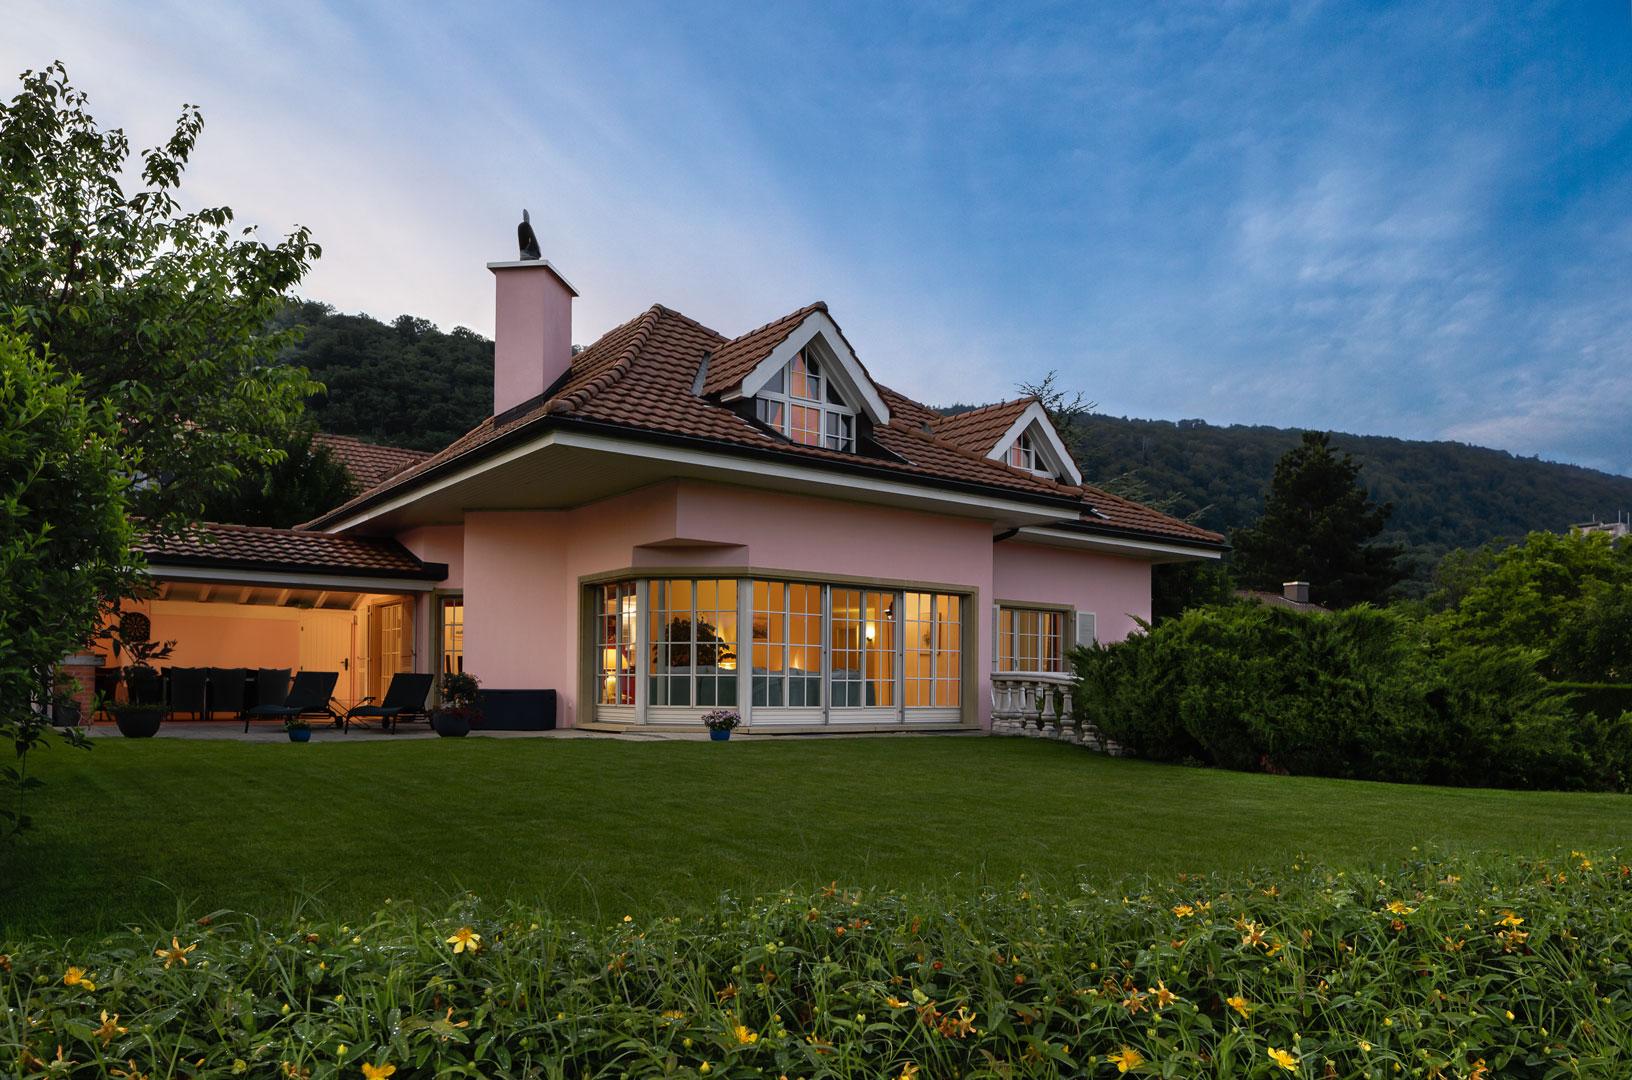 Family home by Hampton Hill photographer, Simon Whitehead